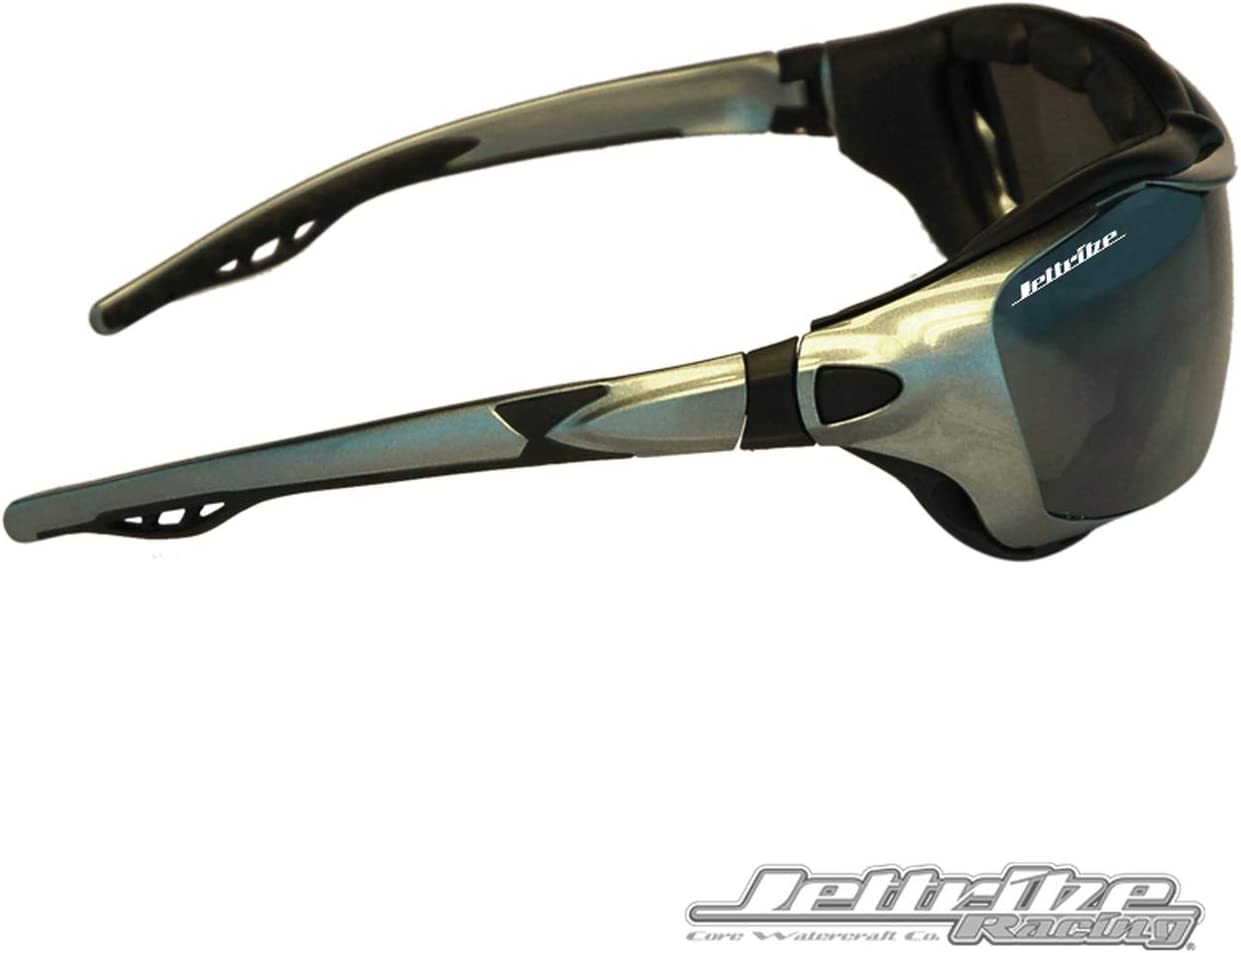 Revo Lens PWC Jetski Goggles Black Frame Sunglasses and Goggles Storm Trooper Hybrid